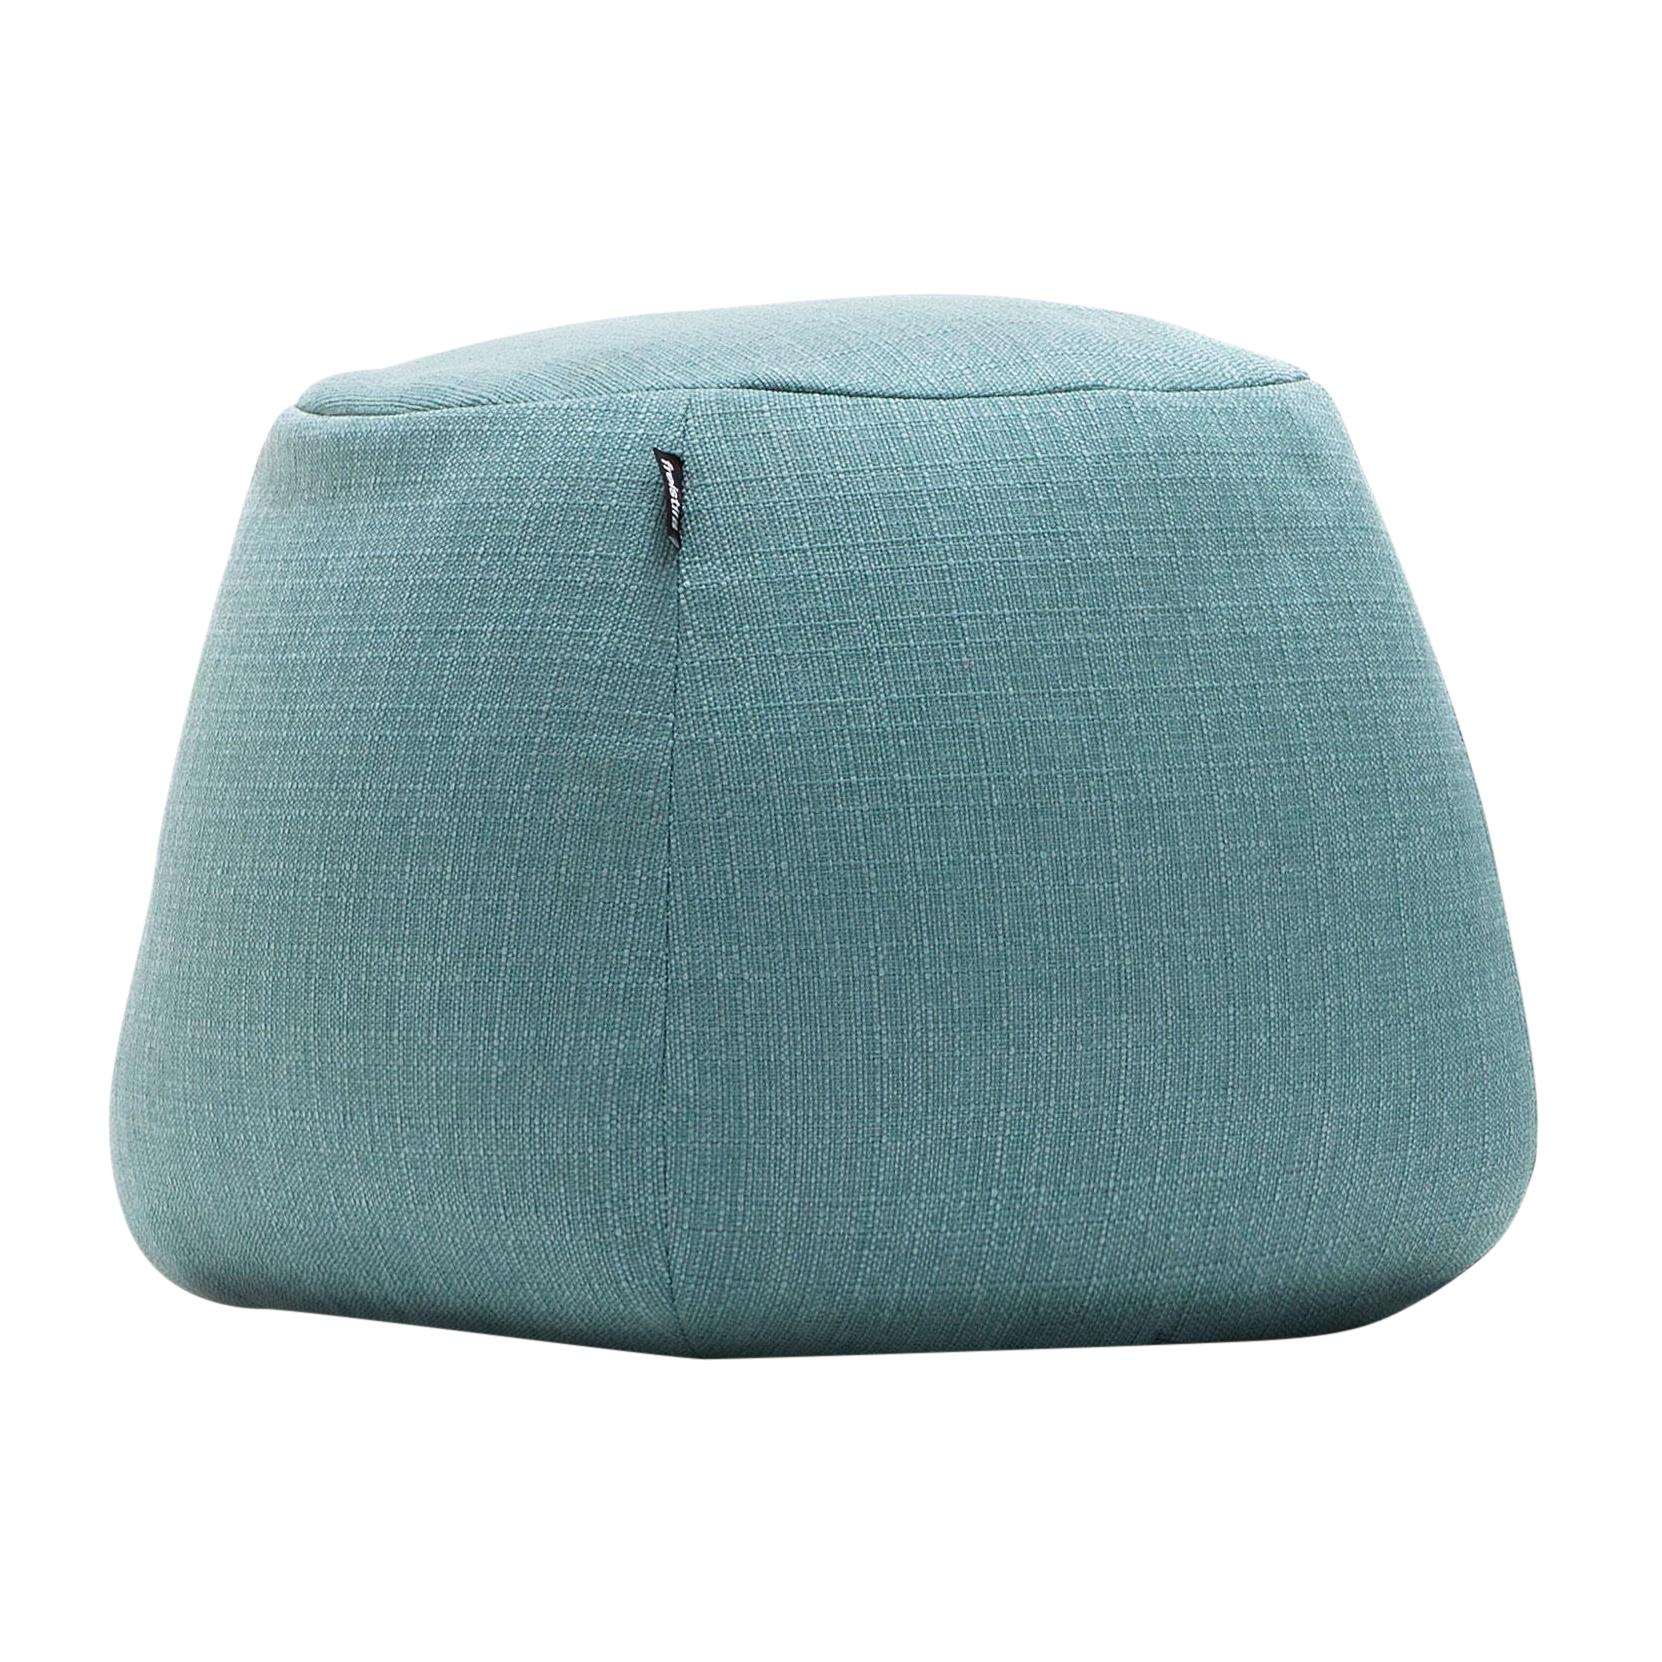 freistil Rolf Benz - freistil 173 - Pouf - turquoise pastel/étoffe 1031 (100% polyester)/rond Ø55cm/H 37cm